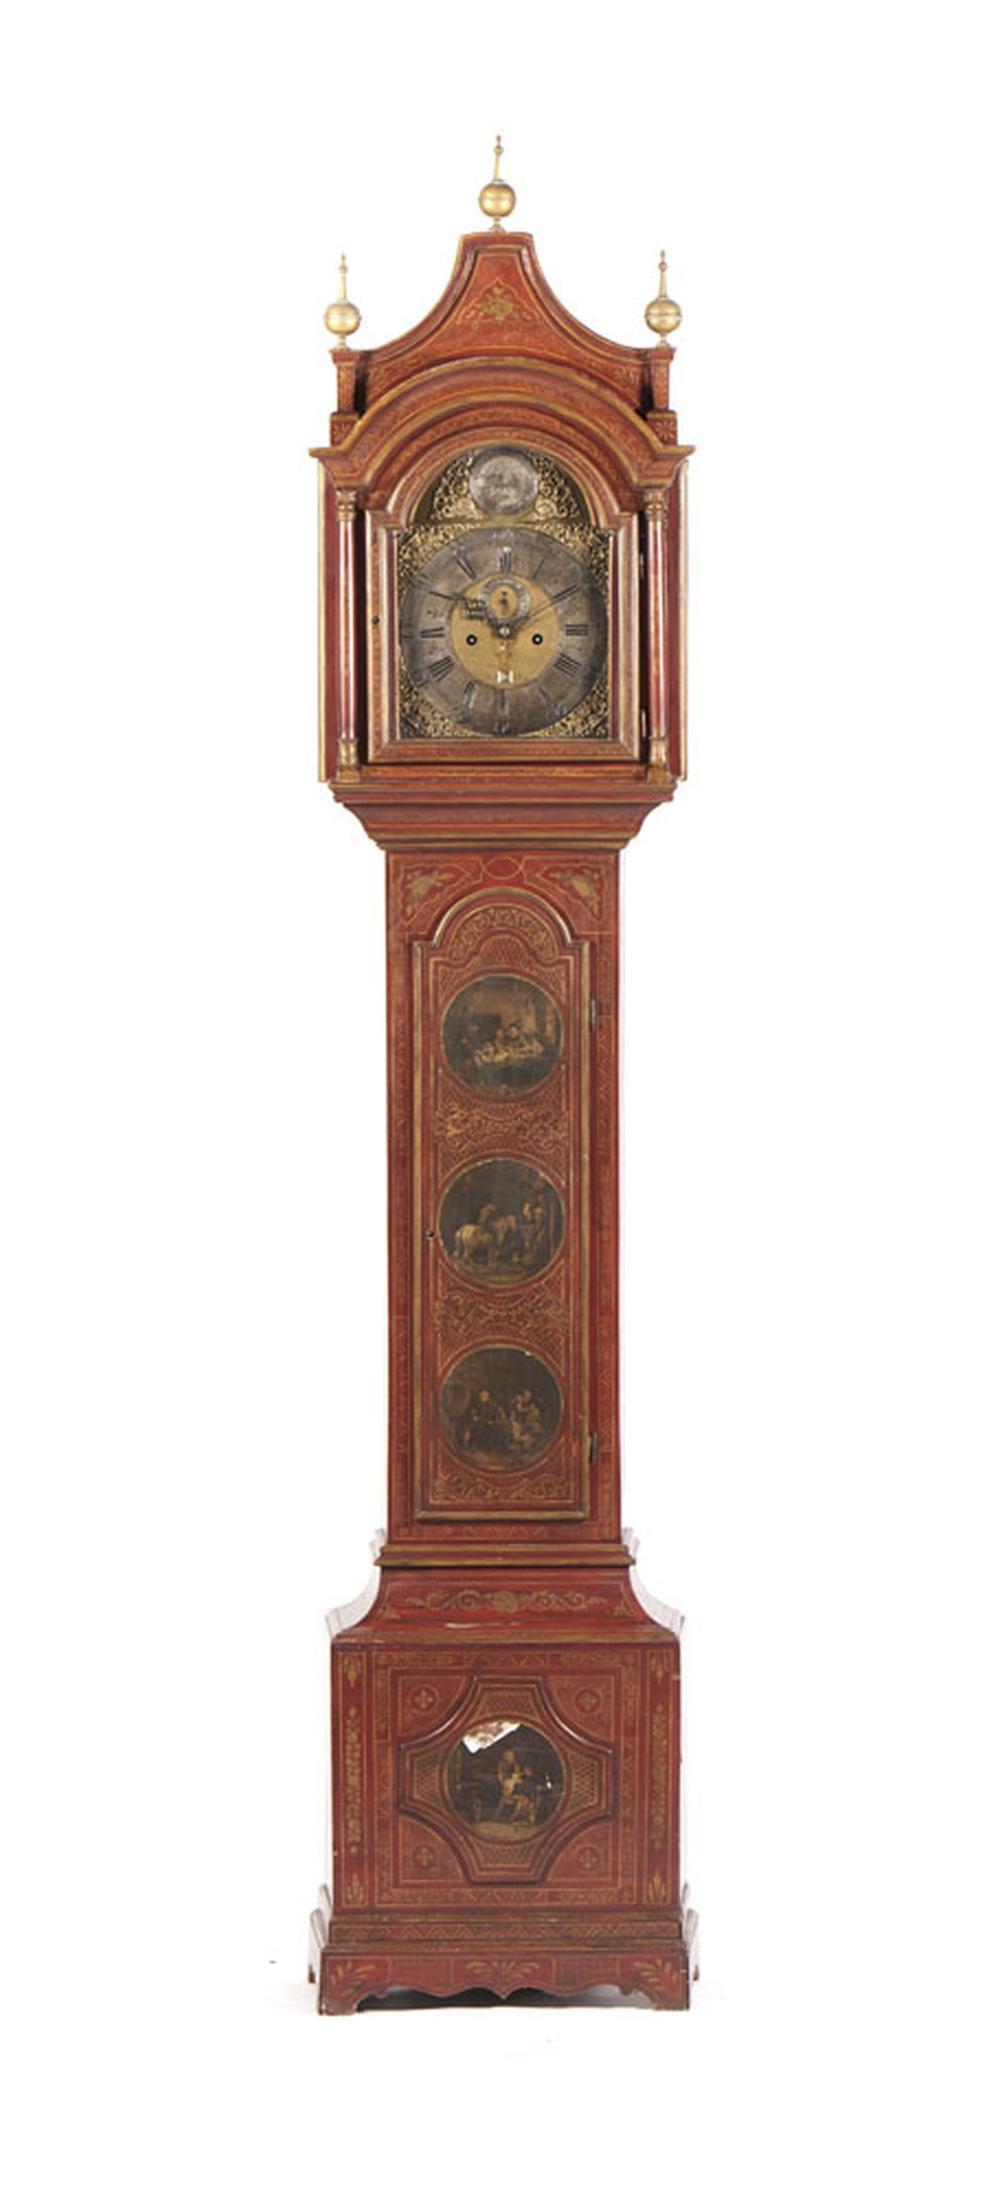 "Relógio de caixa alta ""S. Bartlett Norwich"""